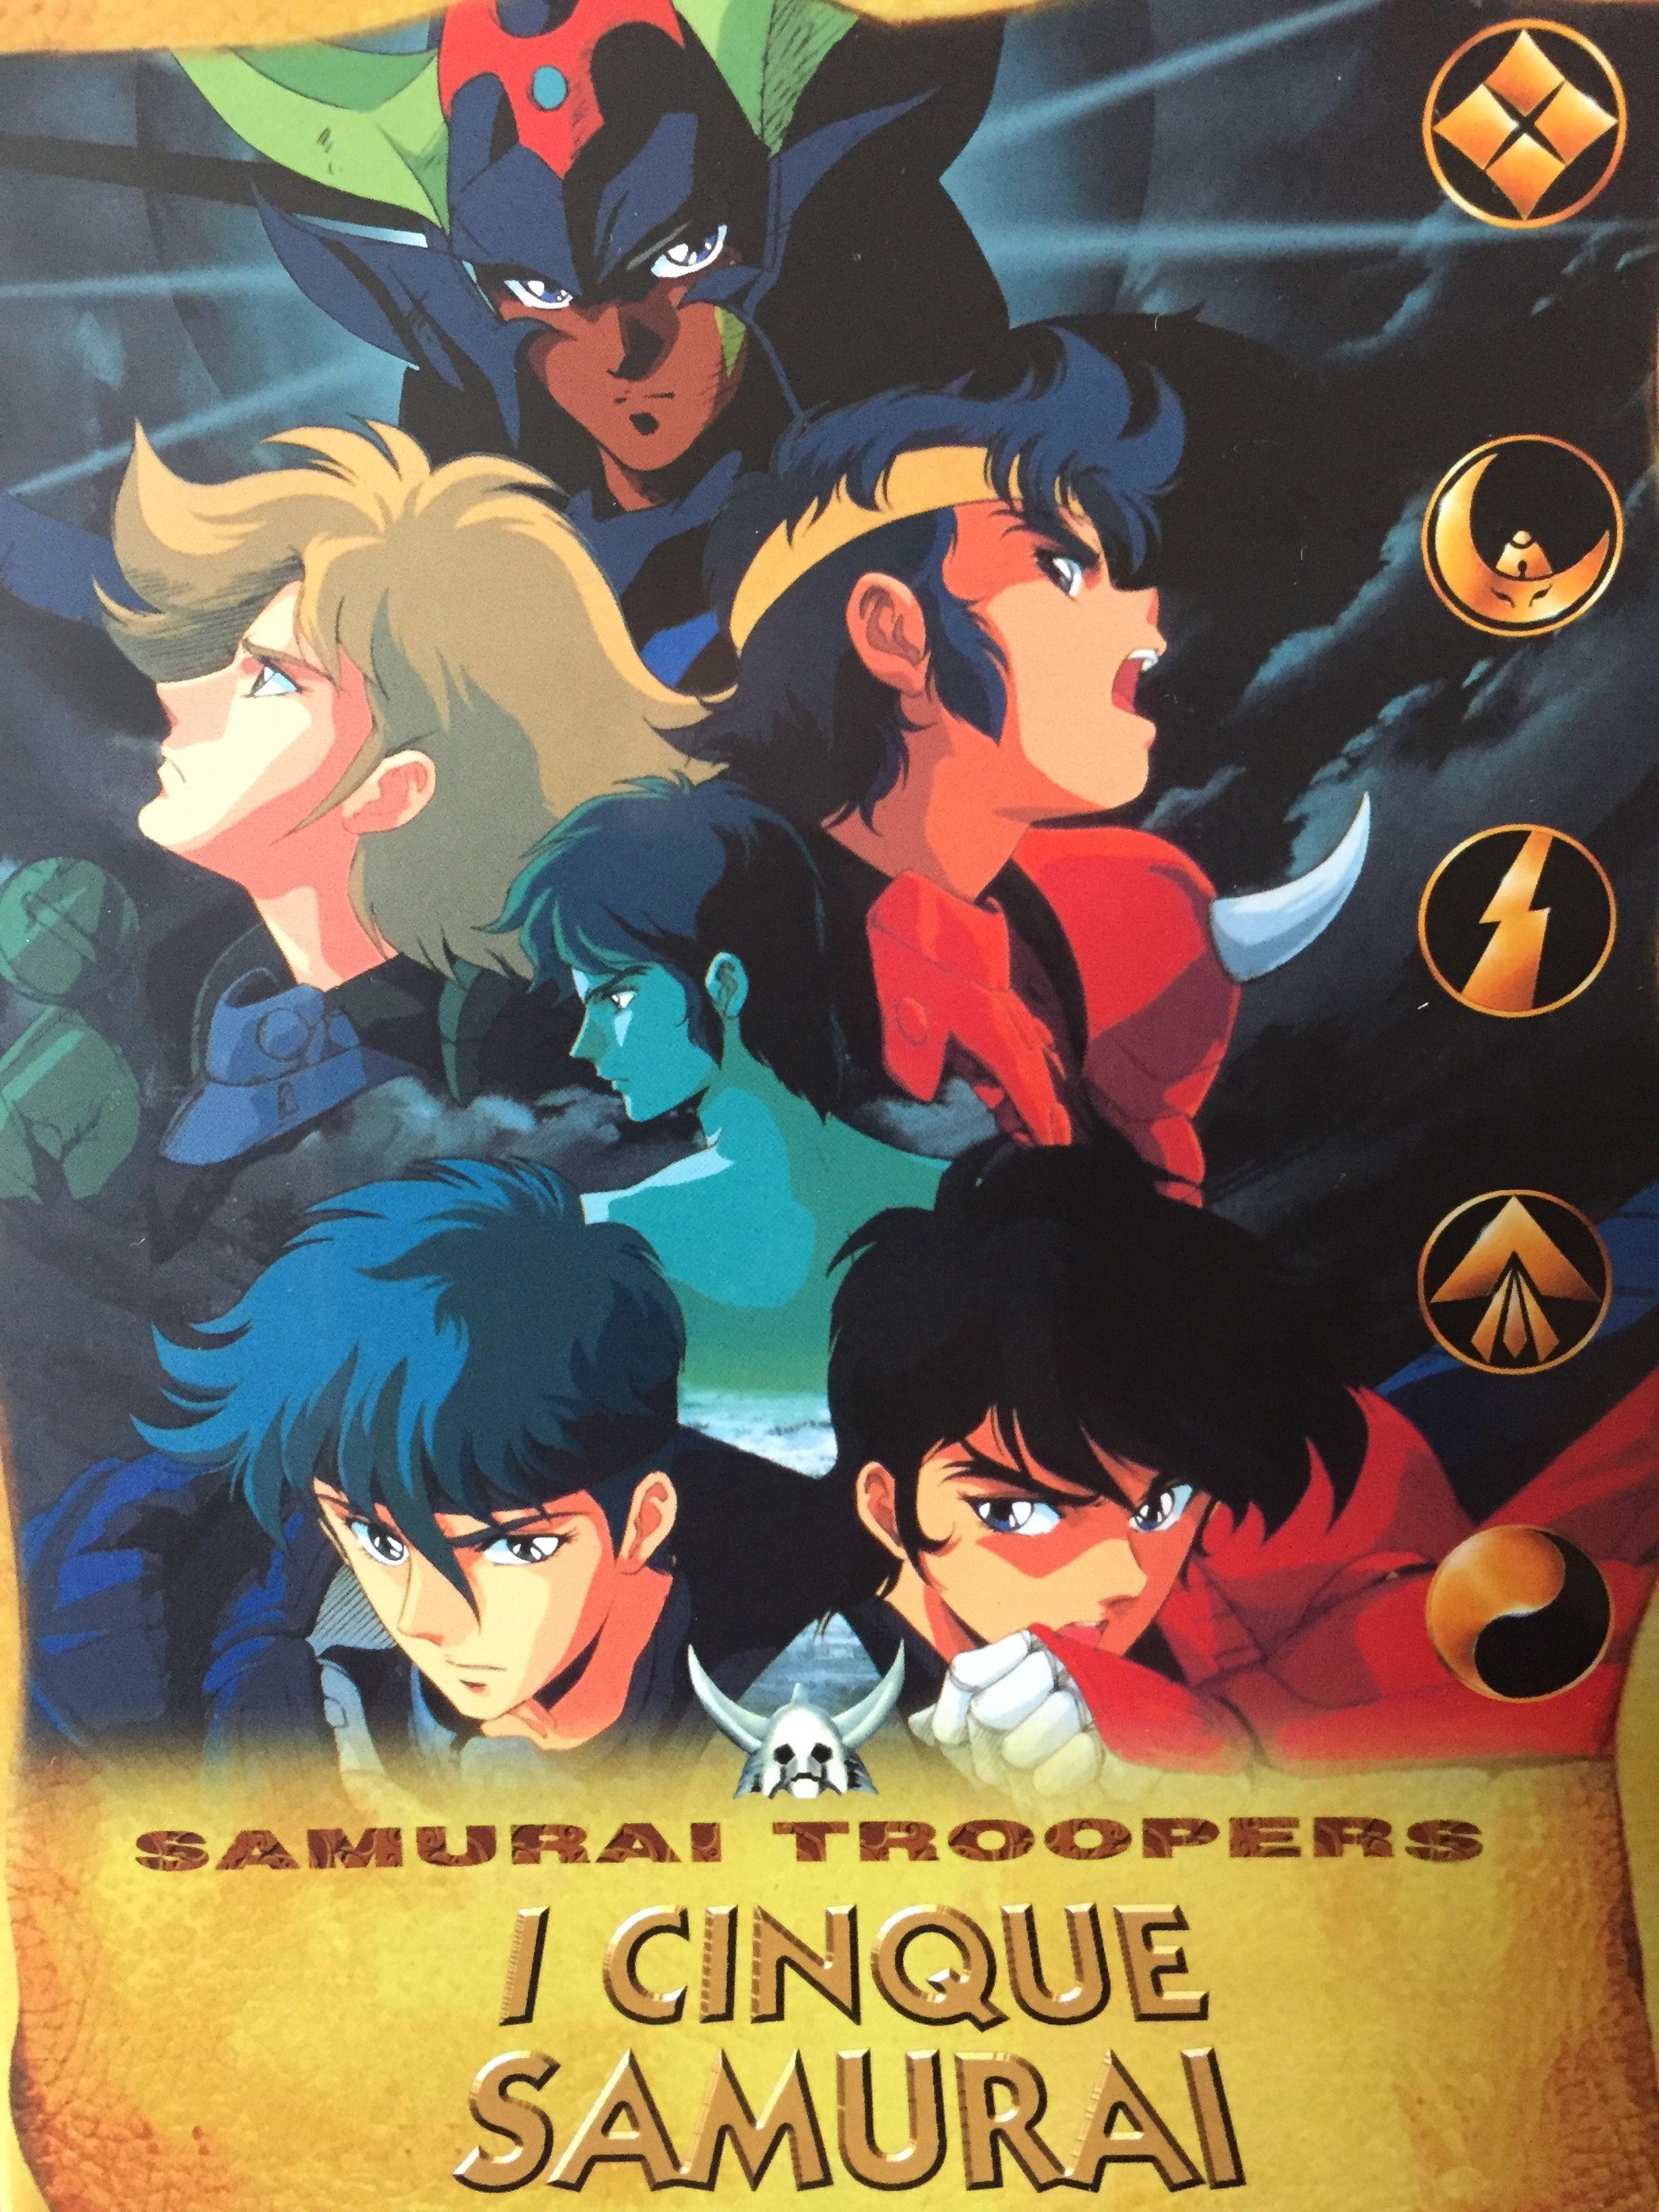 Pin di ErgoSylar su Samurai Troopers I 5 Samurai